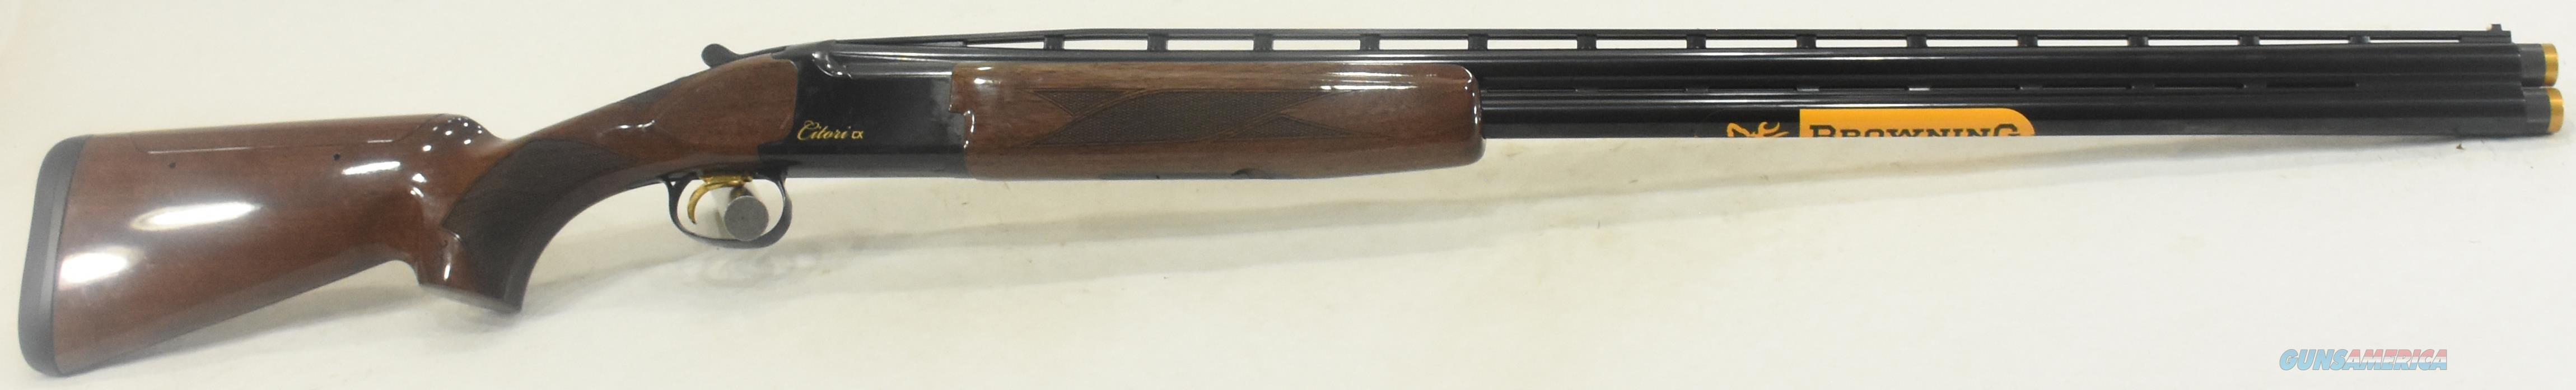 Citori CX Adj 12Ga 32-3In 018111302  Guns > Shotguns > Browning Shotguns > Over Unders > Citori > Hunting